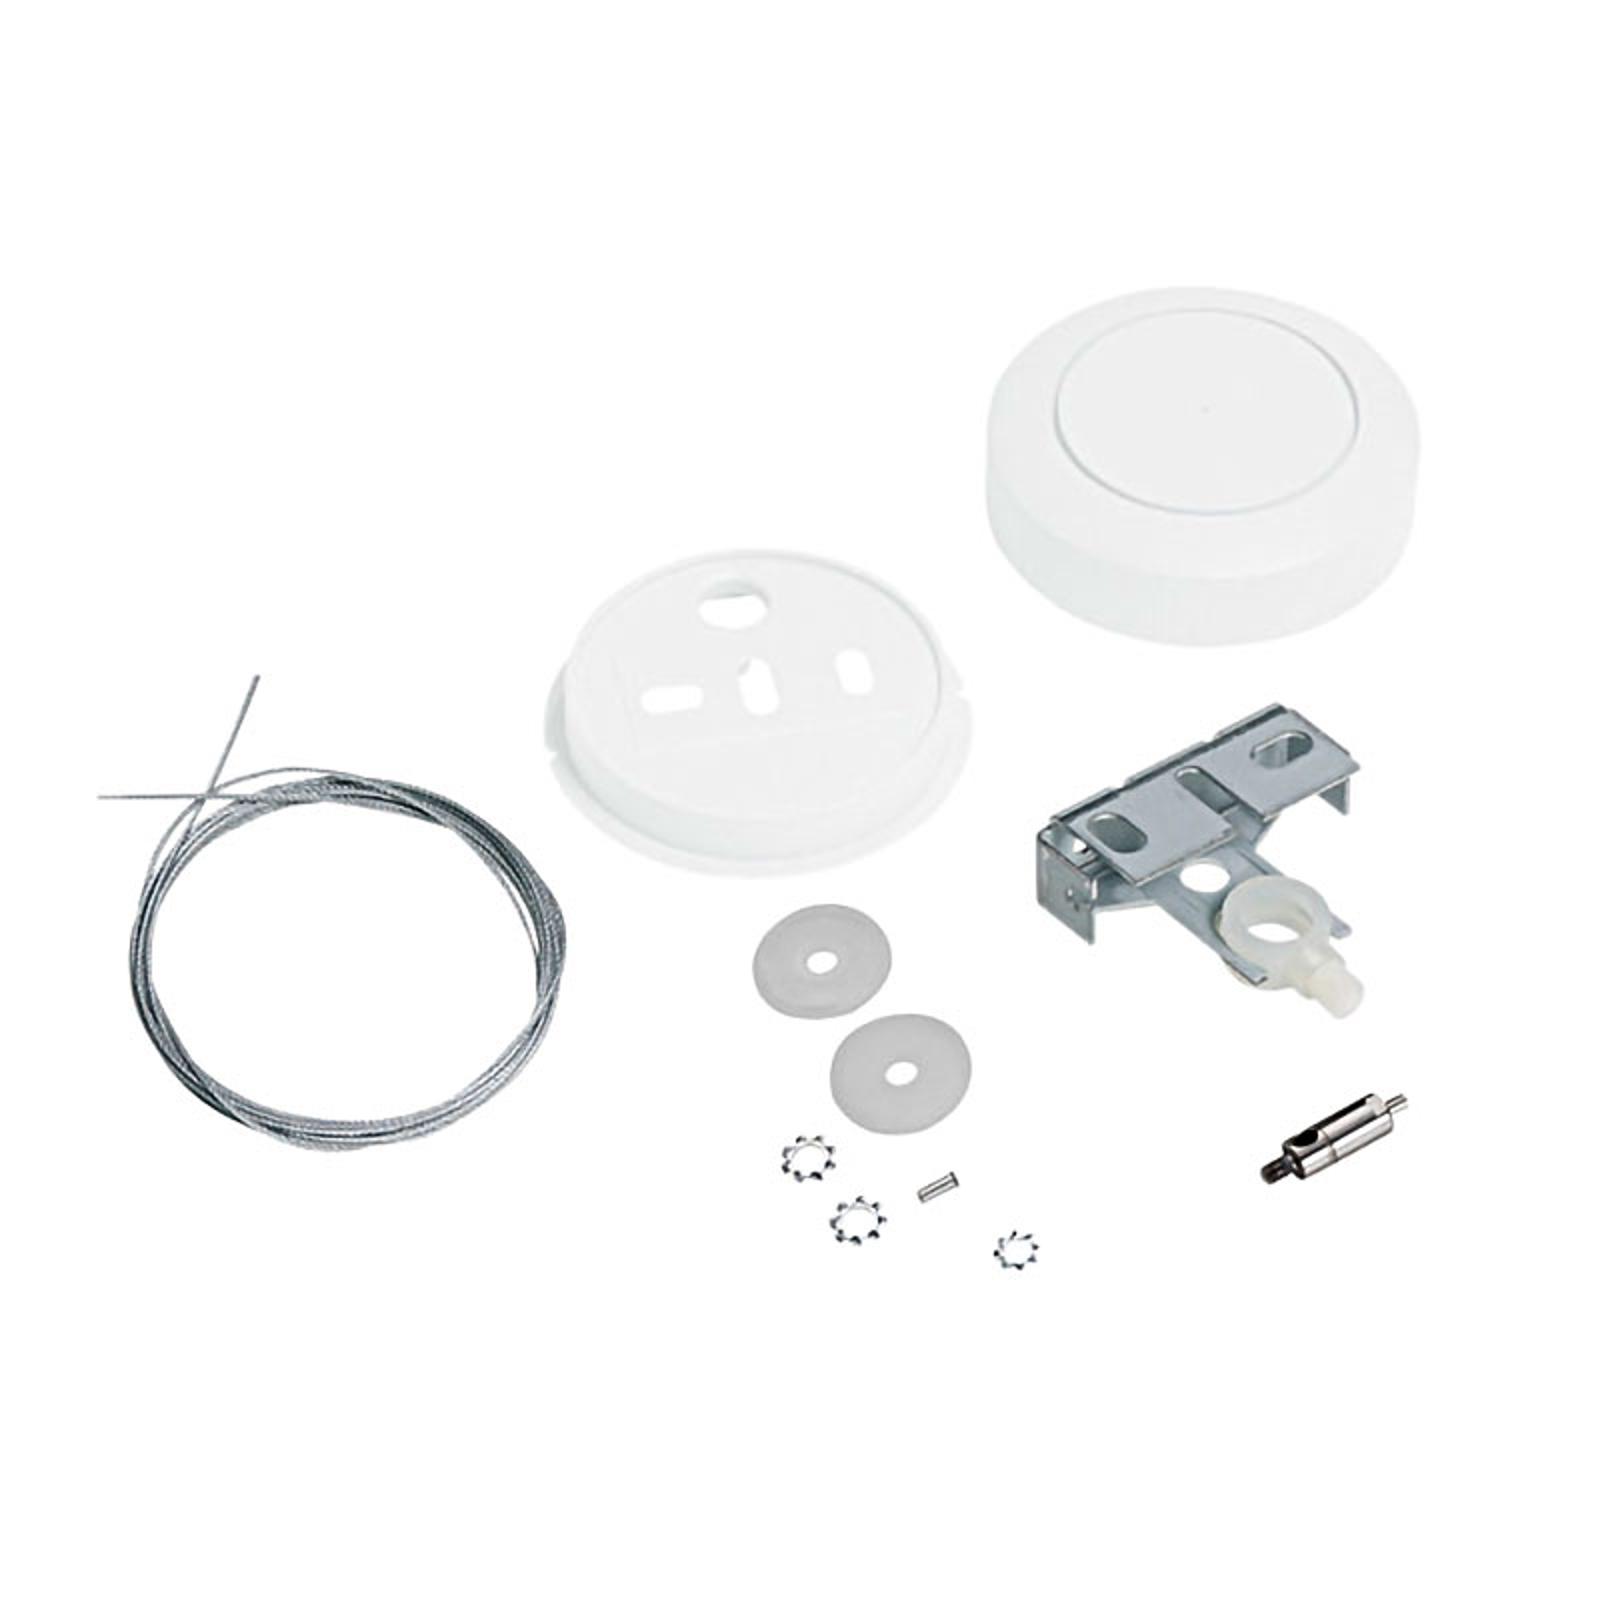 Siteco Vega 1tausopphengssystem baldakin hvit rund